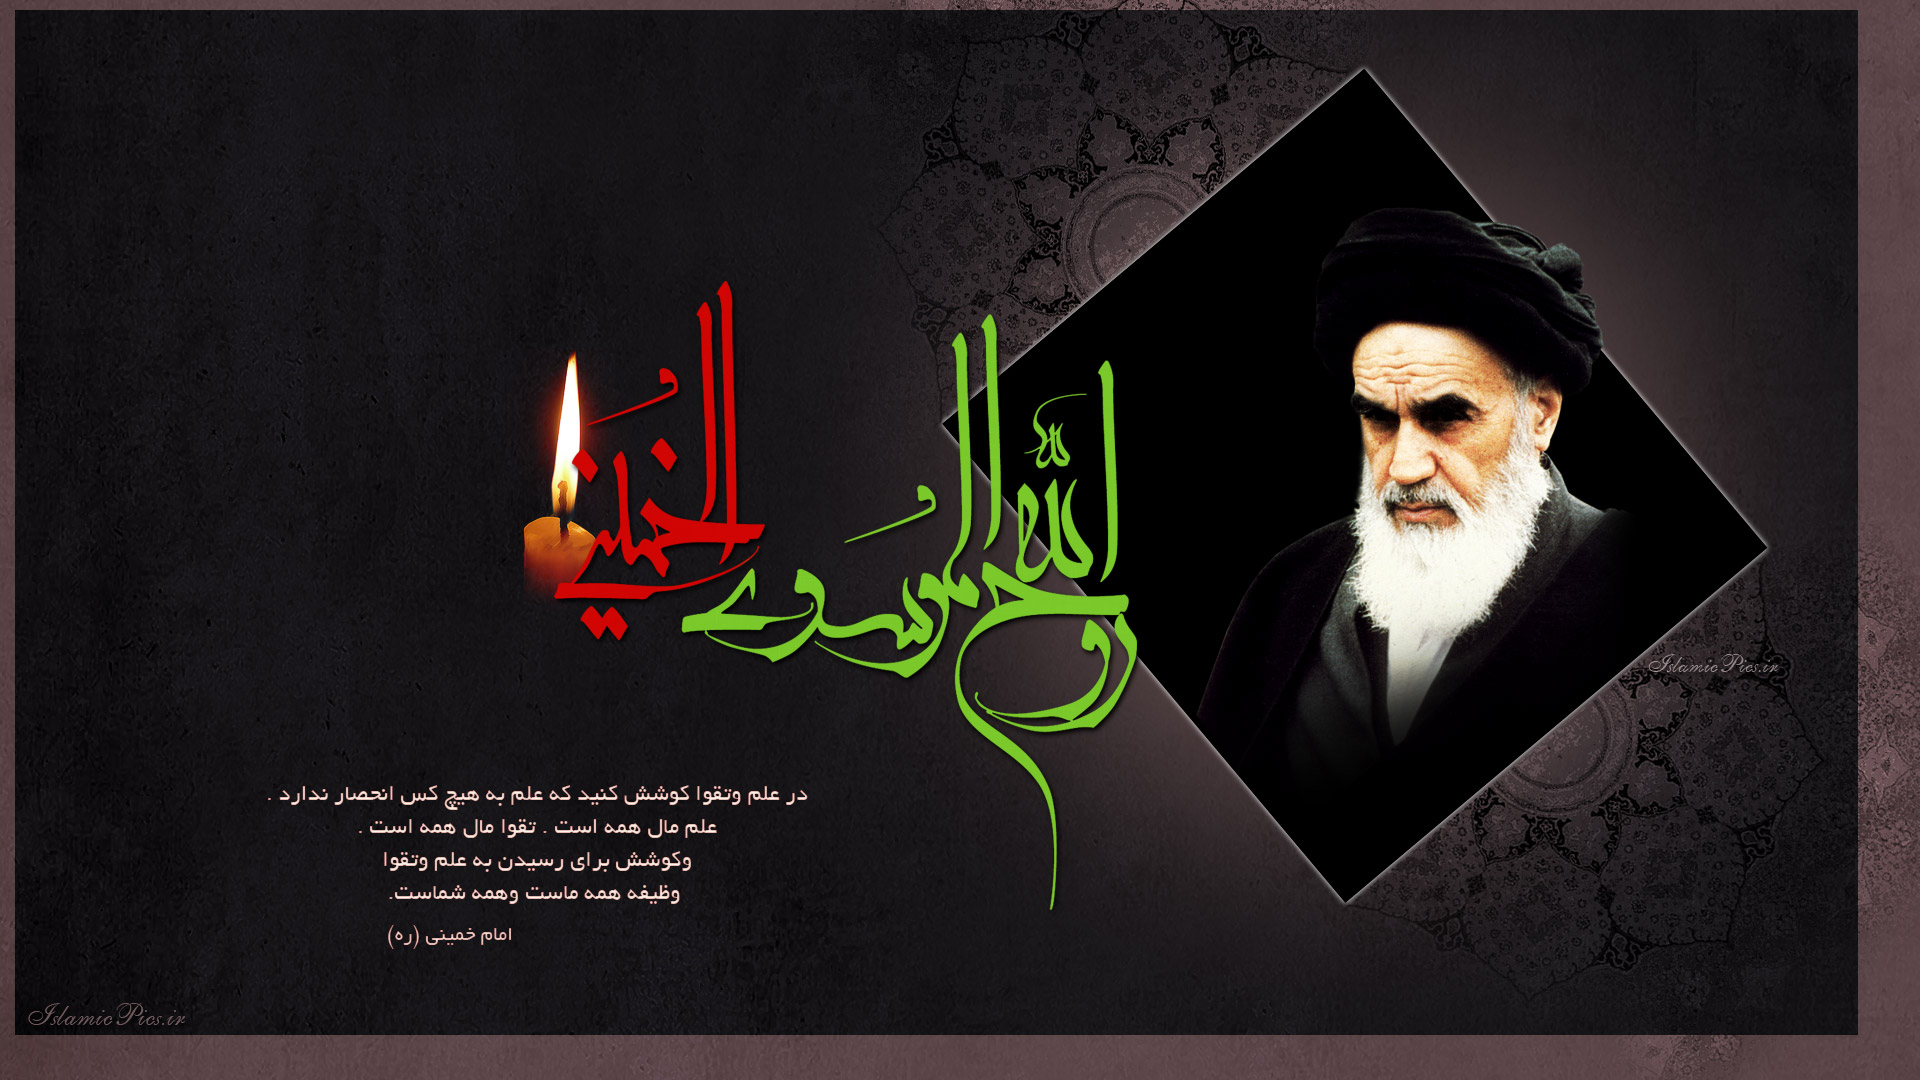 http://islamicpics.ir/wp-content/gallery/wallpaper/wallpaper-rehlat-imam-khomeiyni.jpg